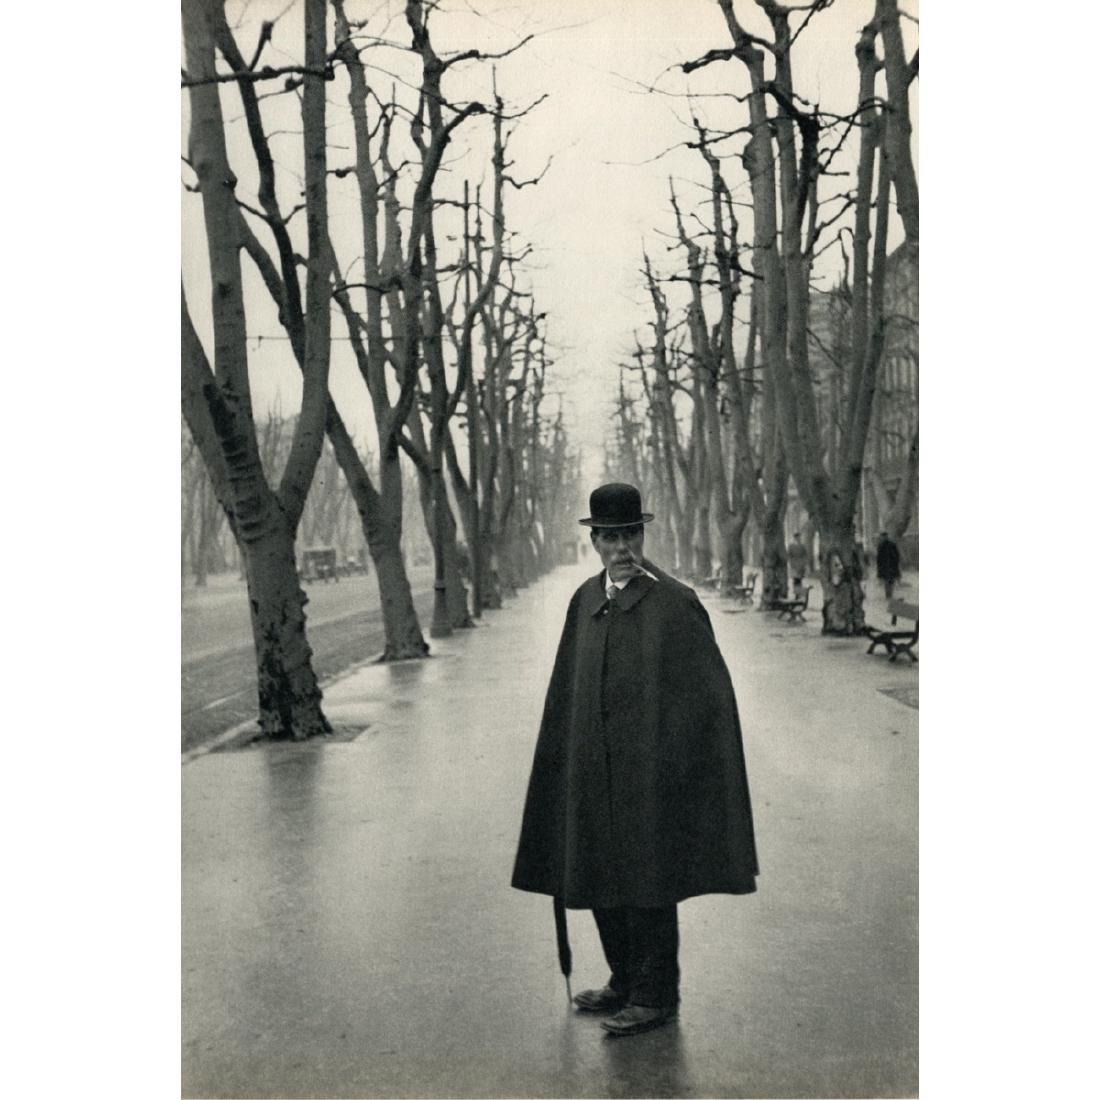 HENRI CARTIER-BRESSON - Allee du Prado